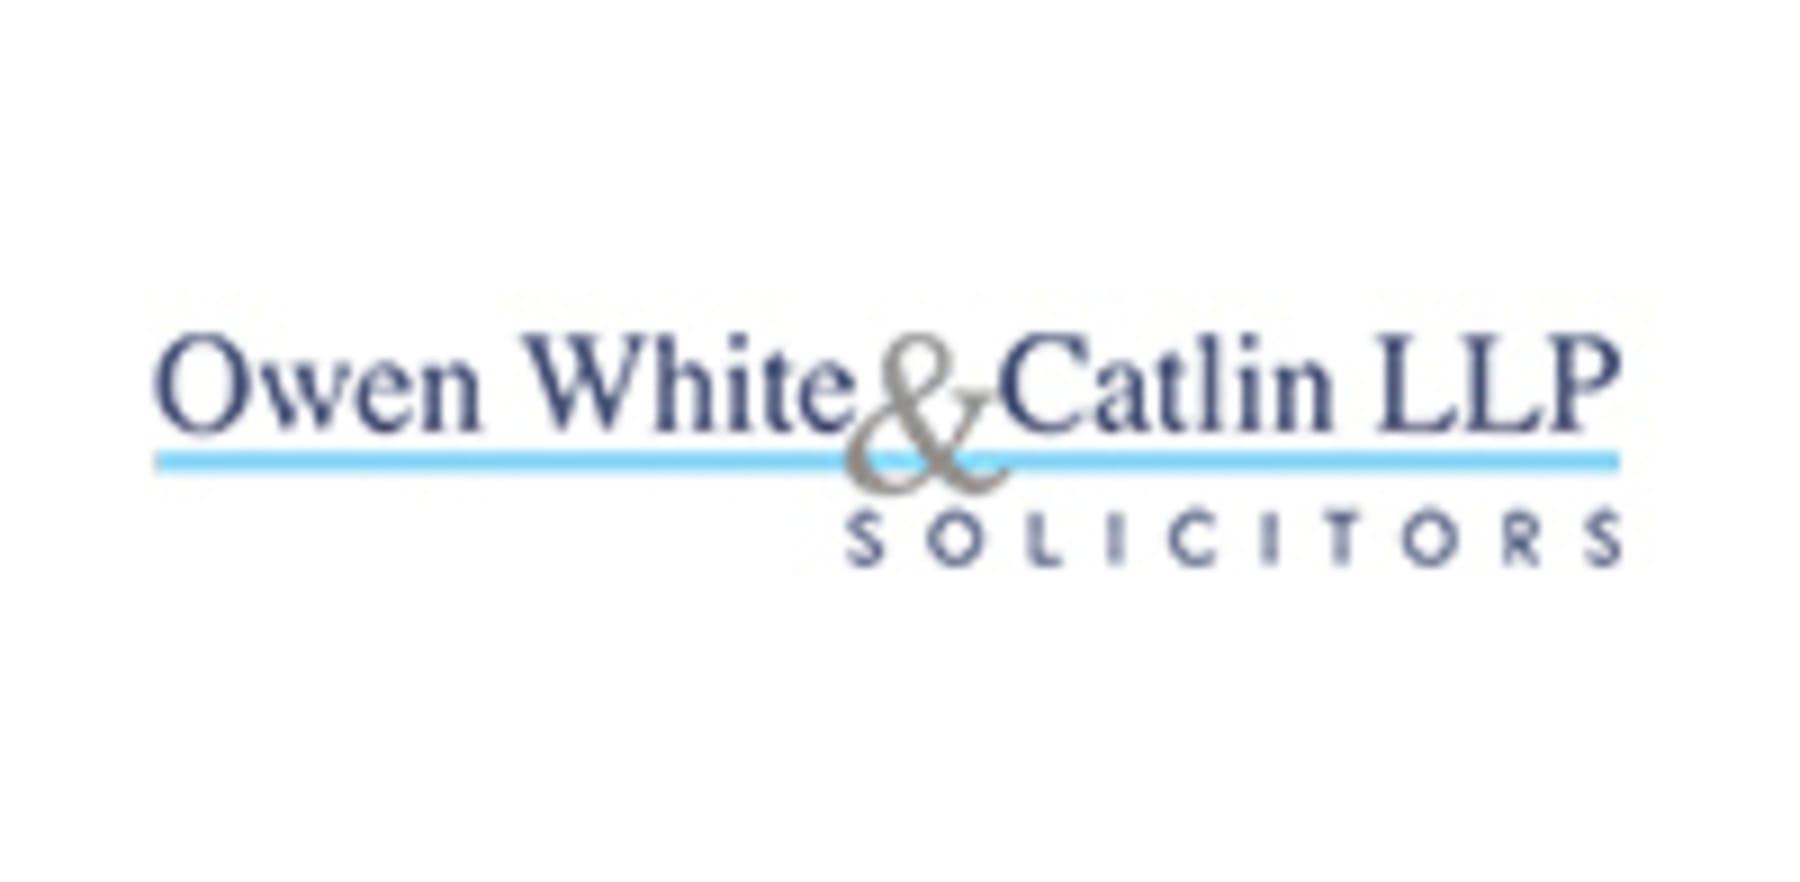 Owen White & Catlin Solicitors